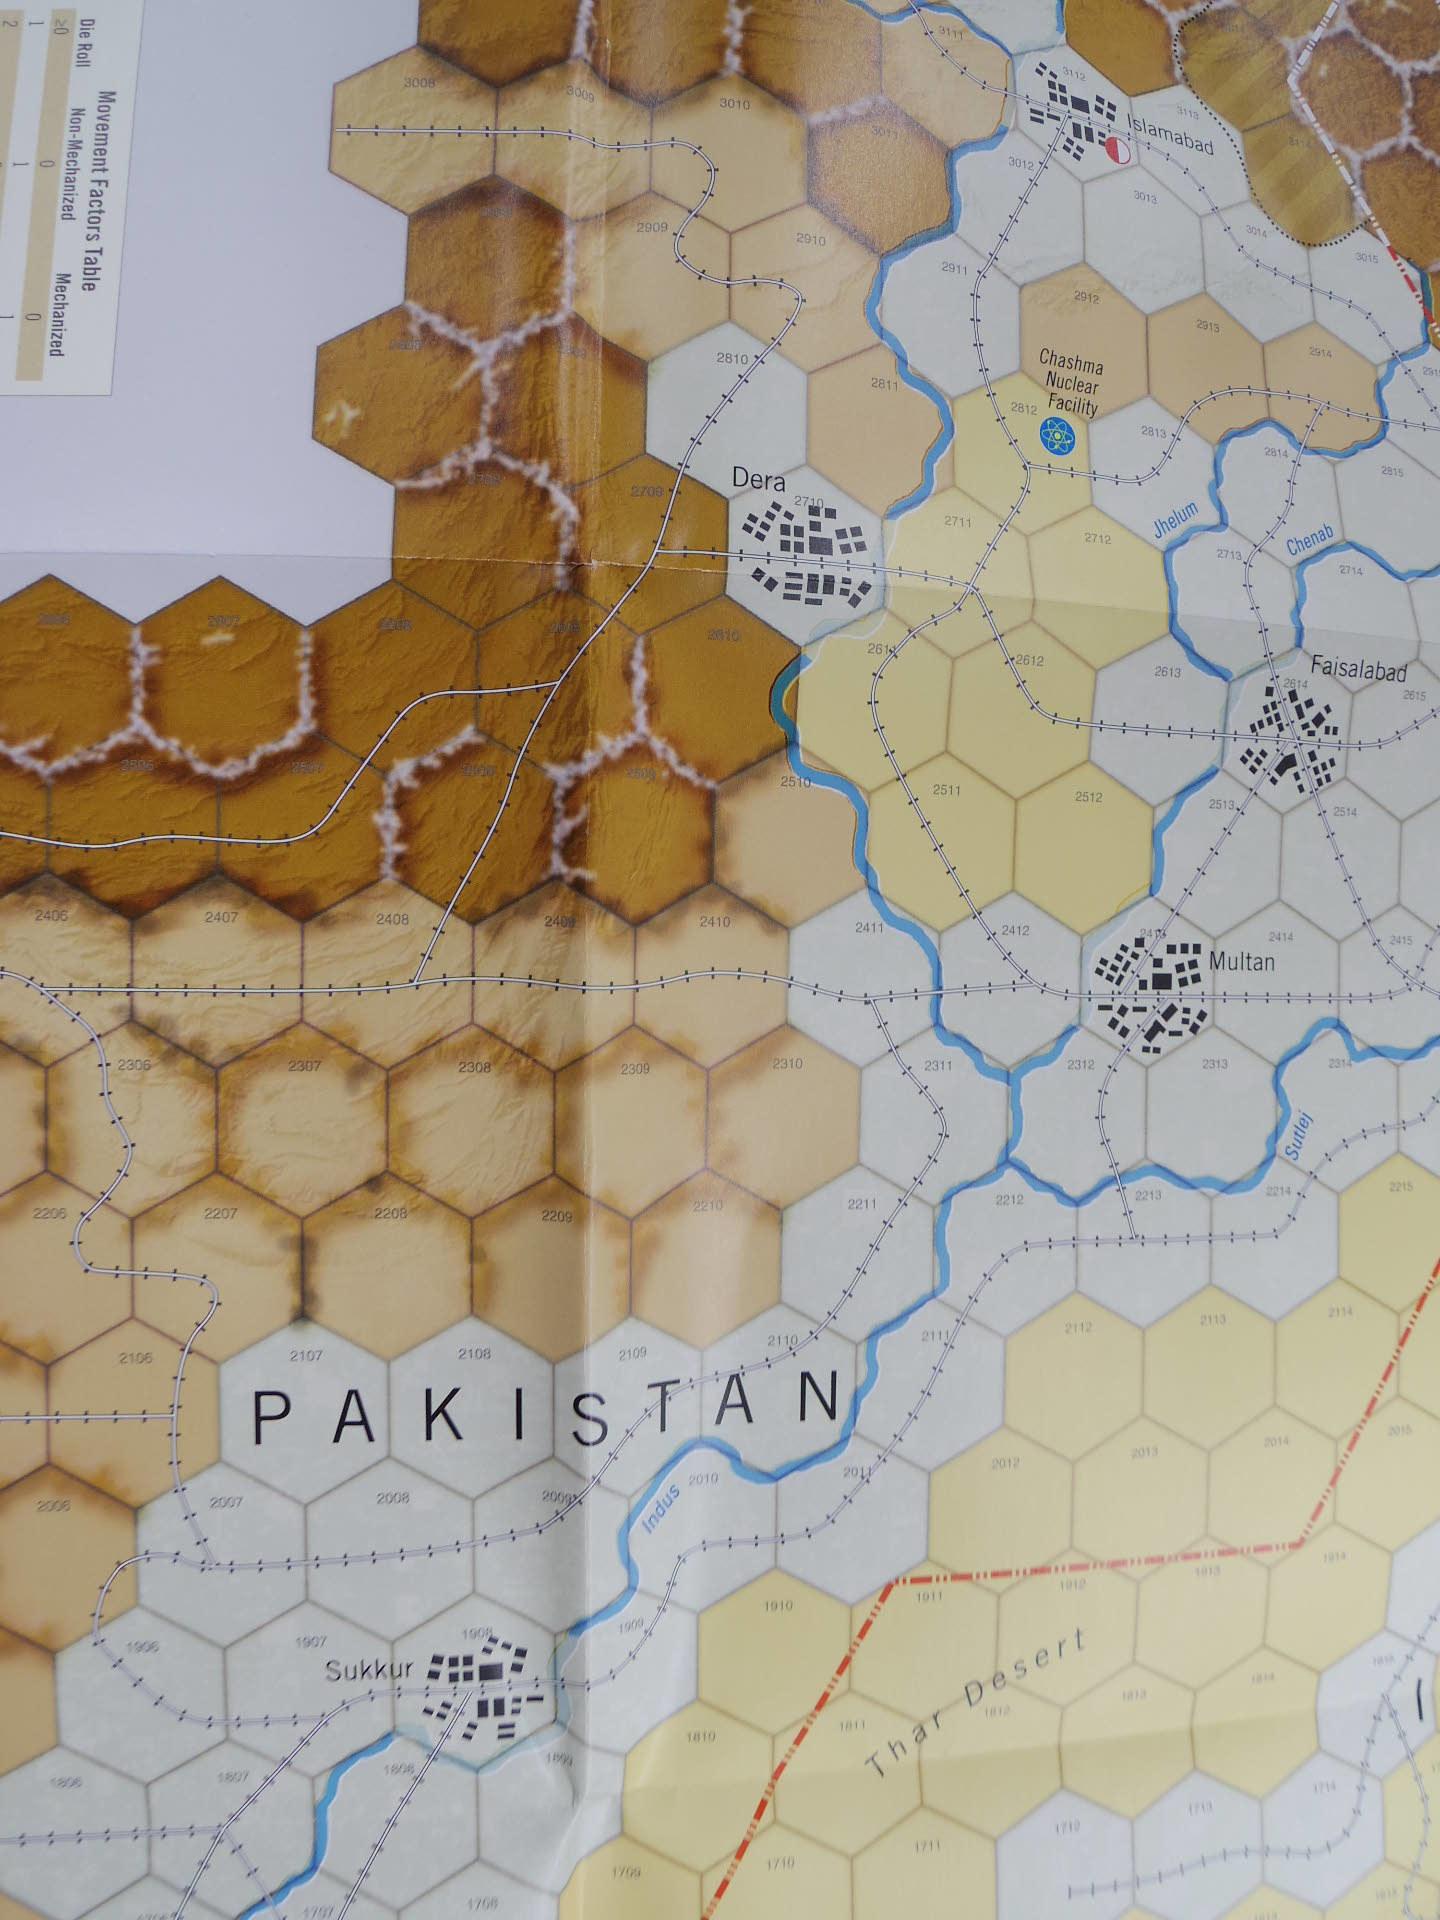 Modern War誌#36 Cold Start: The Next India-Pakistan War... 2018.06.17(日)YSGA第348回定例会に持ち寄られ_b0173672_23122586.jpg